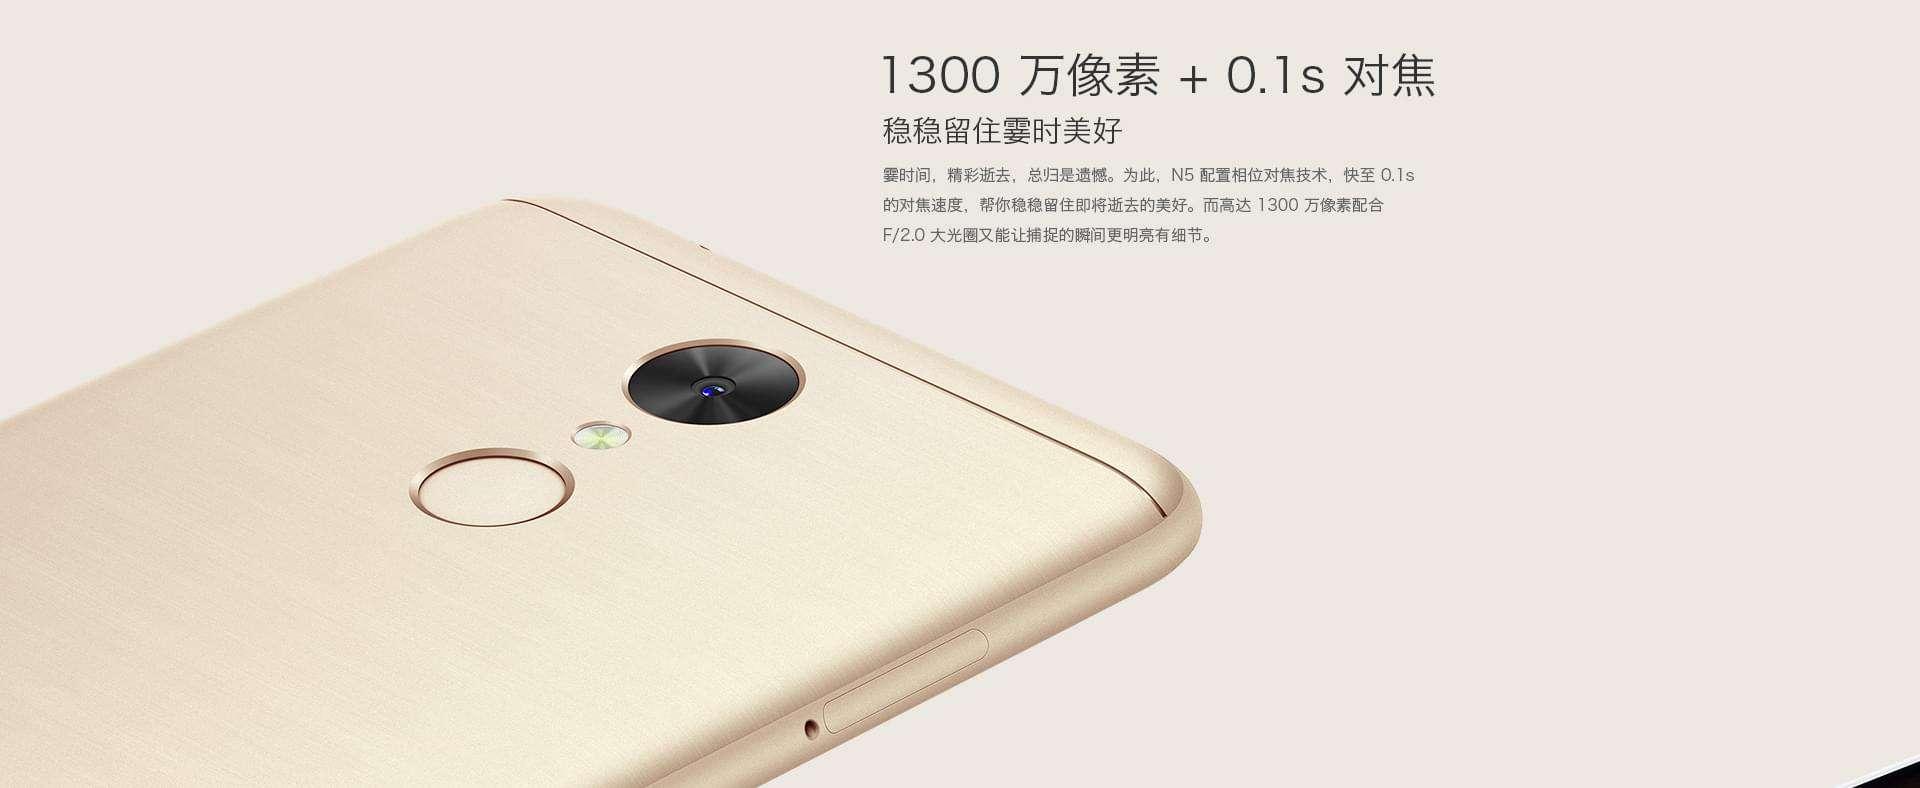 Qihoo 360 N5 3